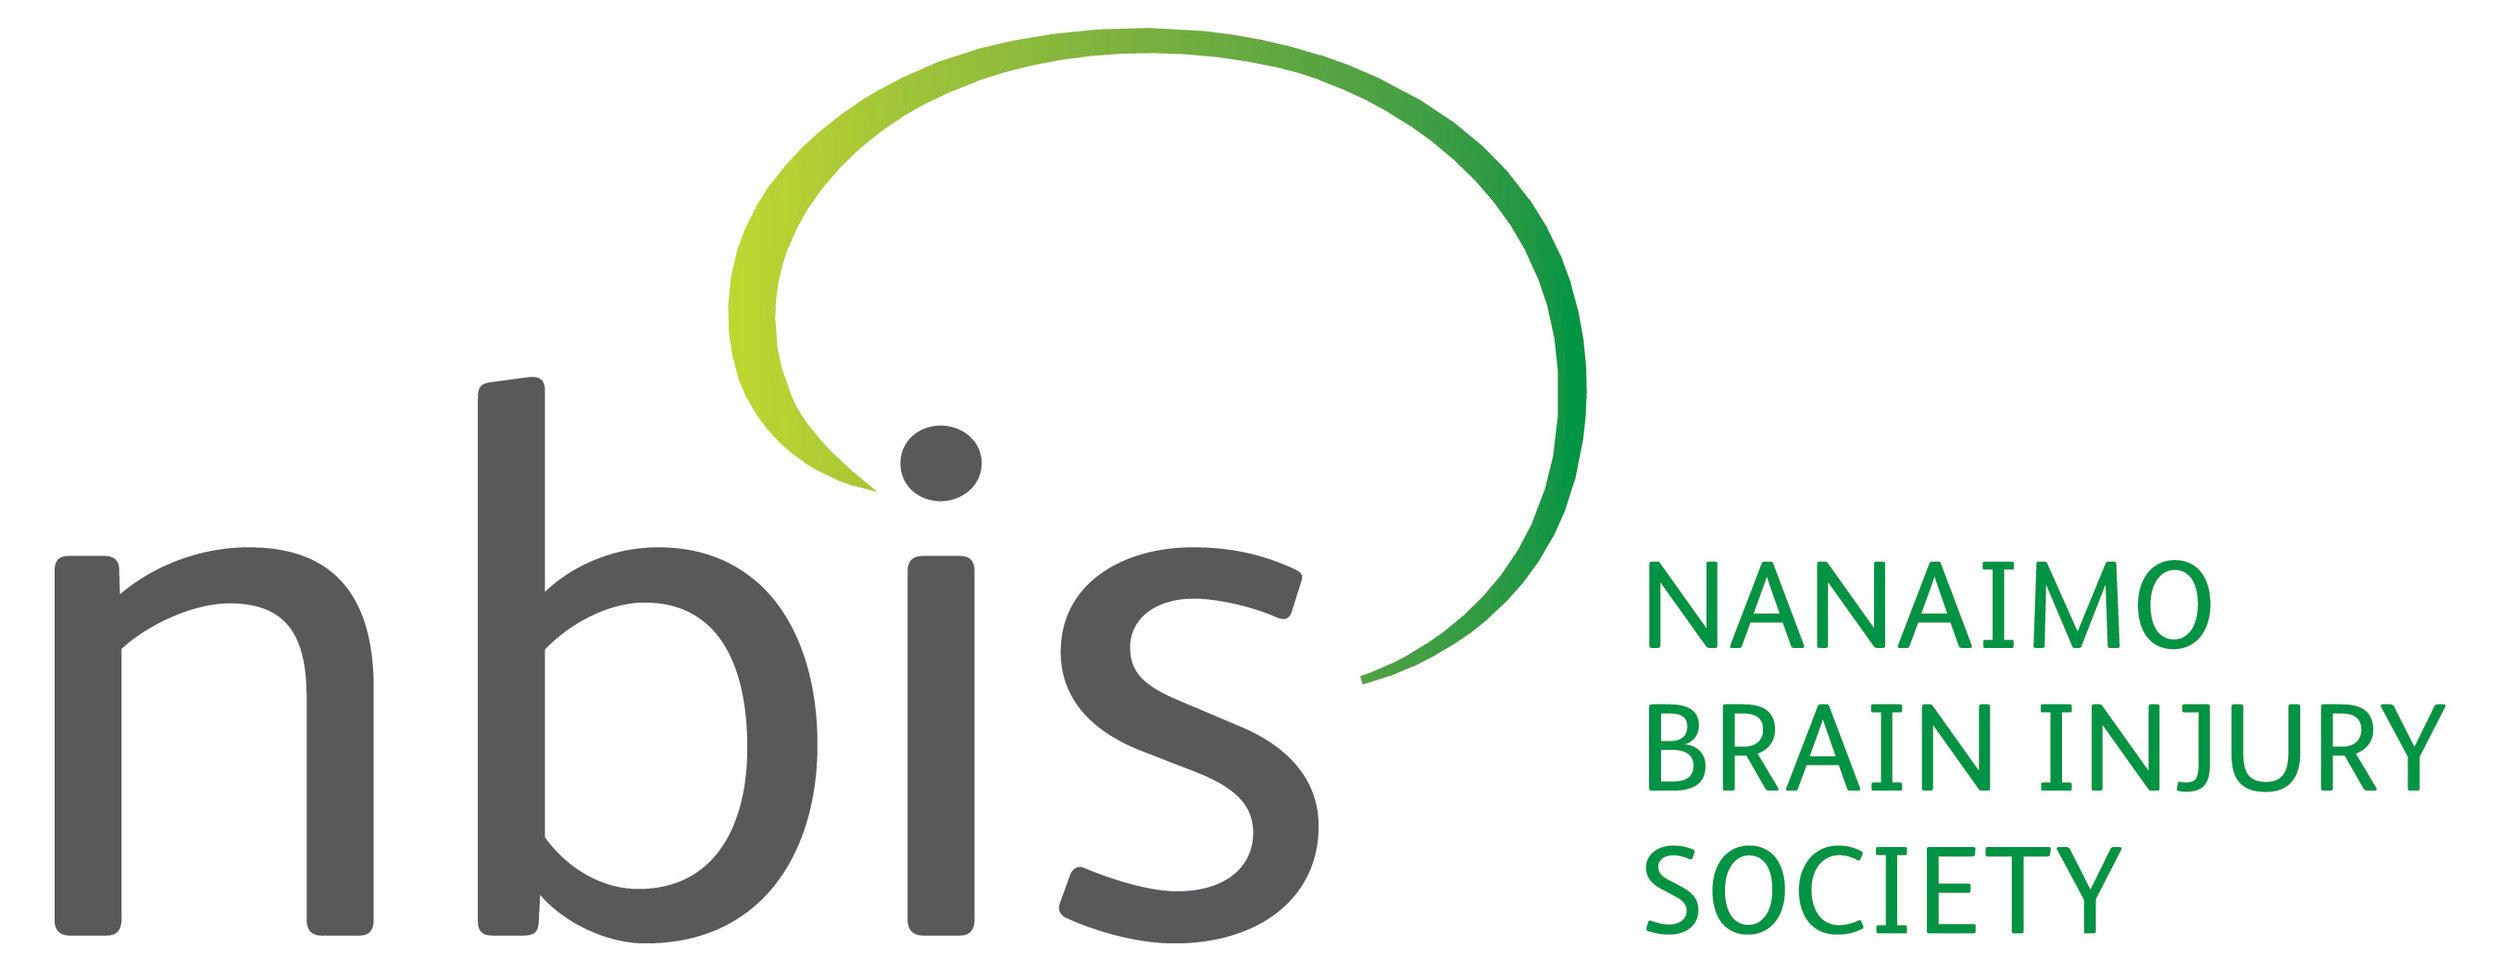 NBIS-logo-horiz-RGB-no-tagline-large.jpg